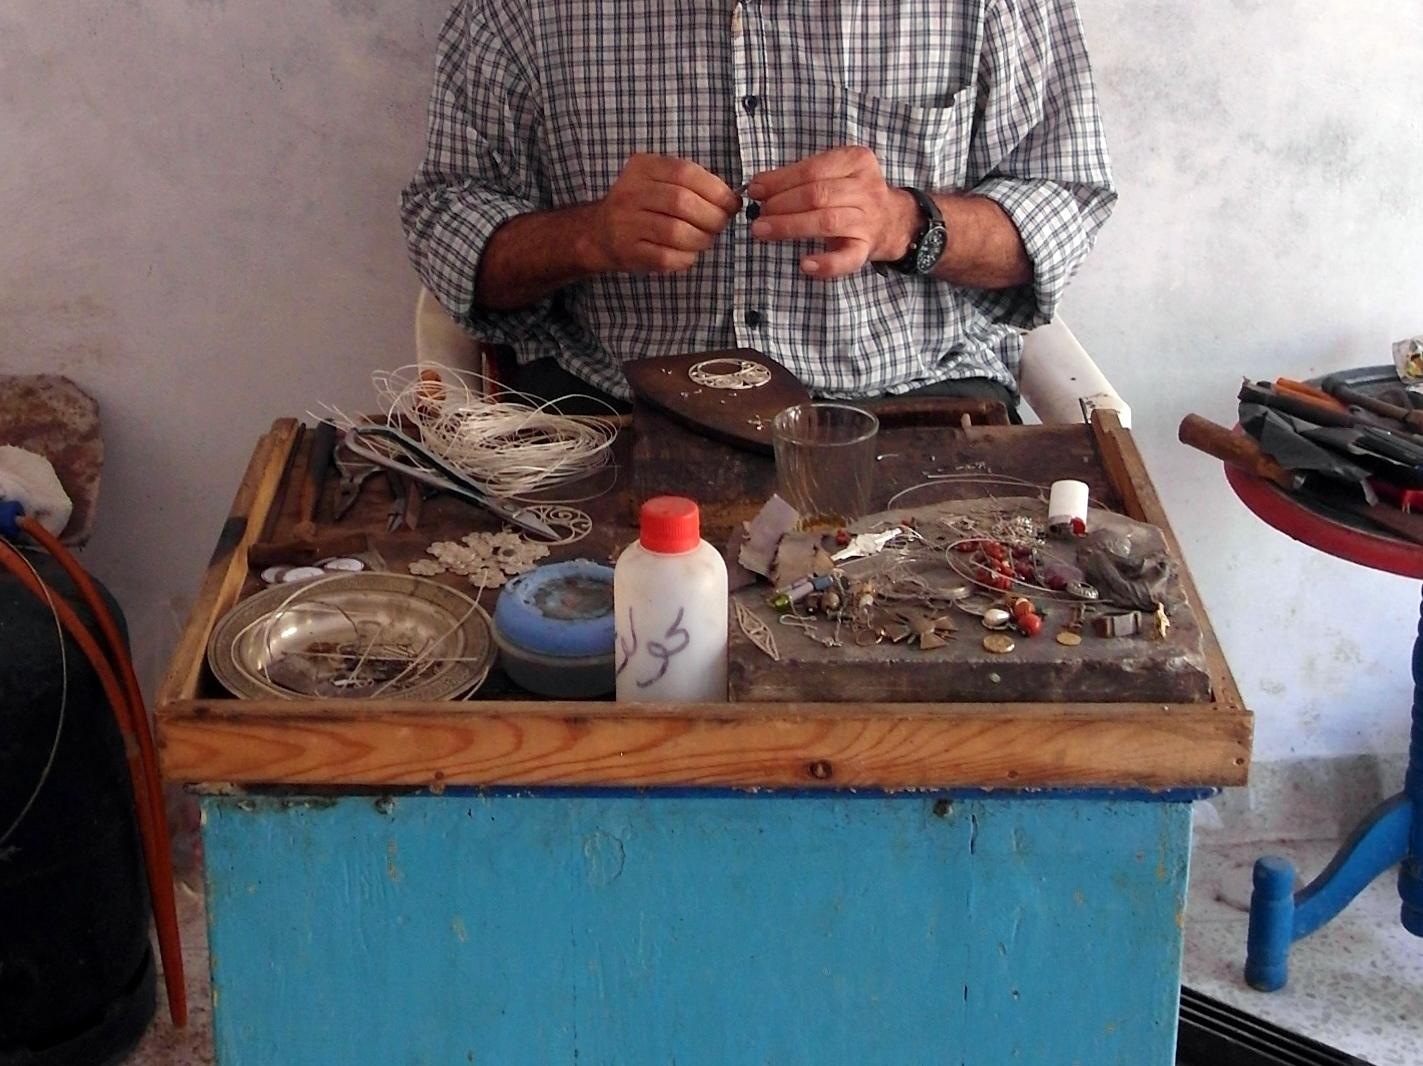 Copy of A filligree silversmith in Essaouira.JPG